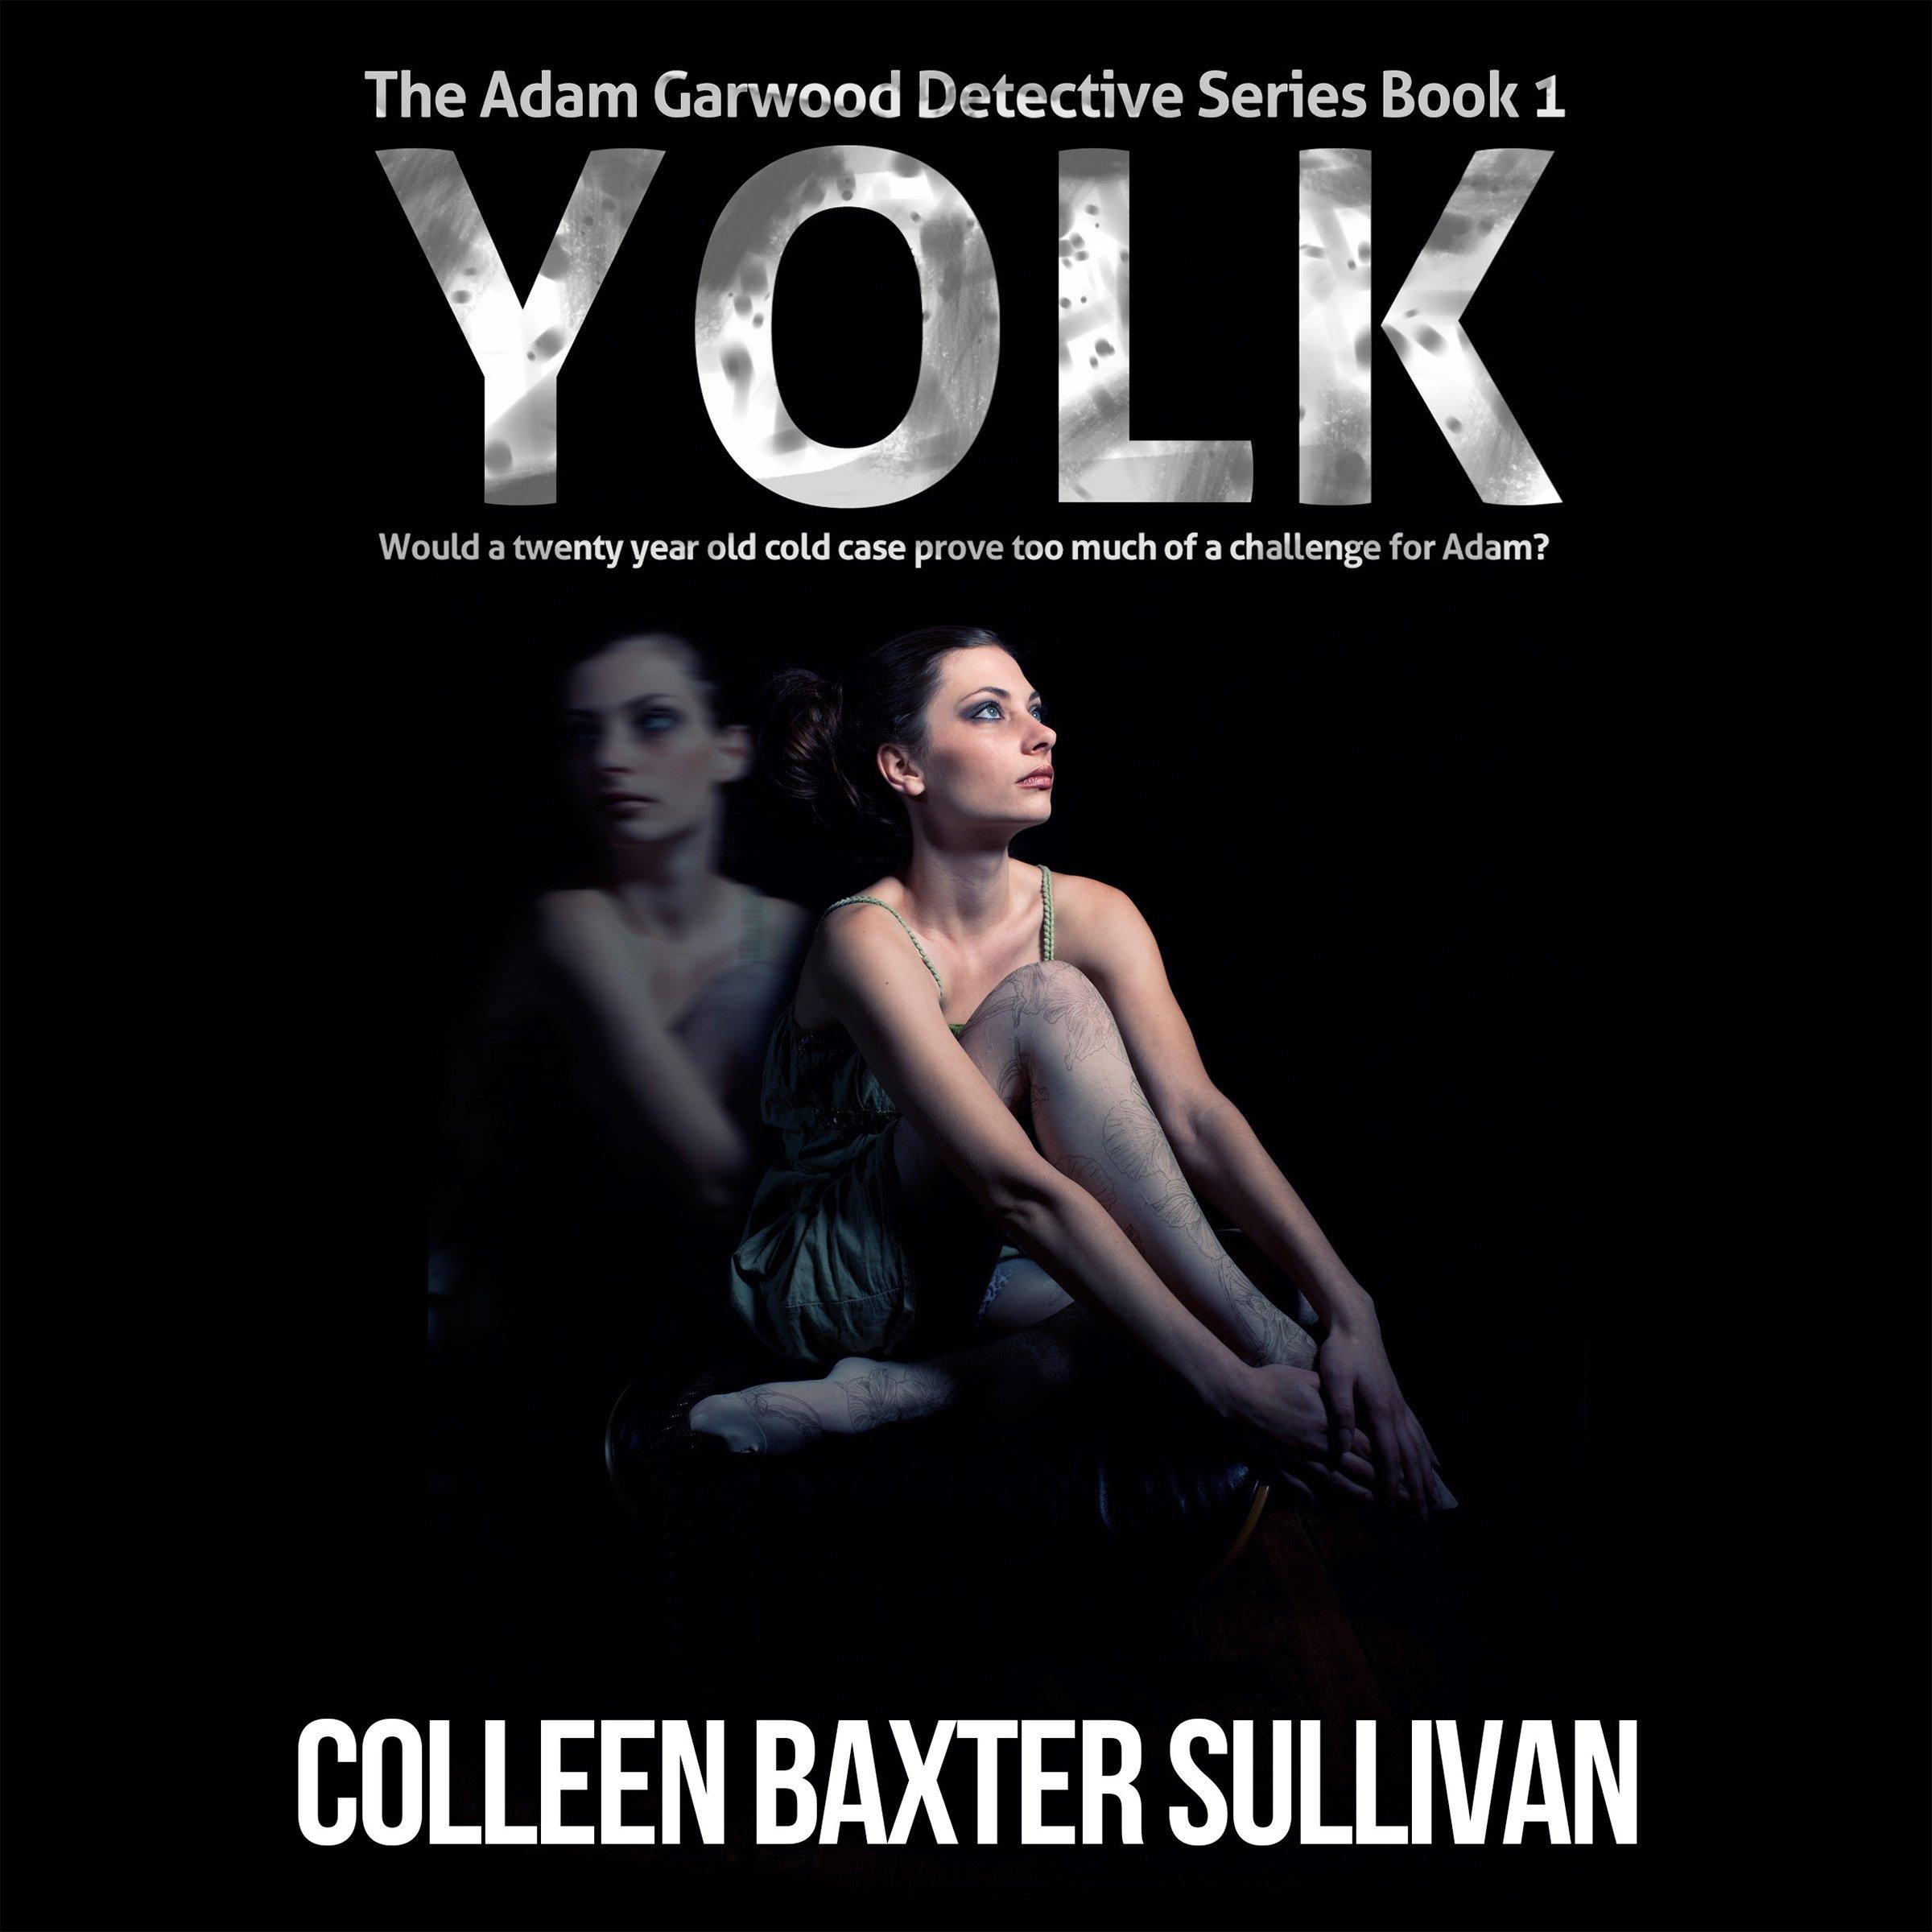 Yolk: The Adam Garwood Detective Series